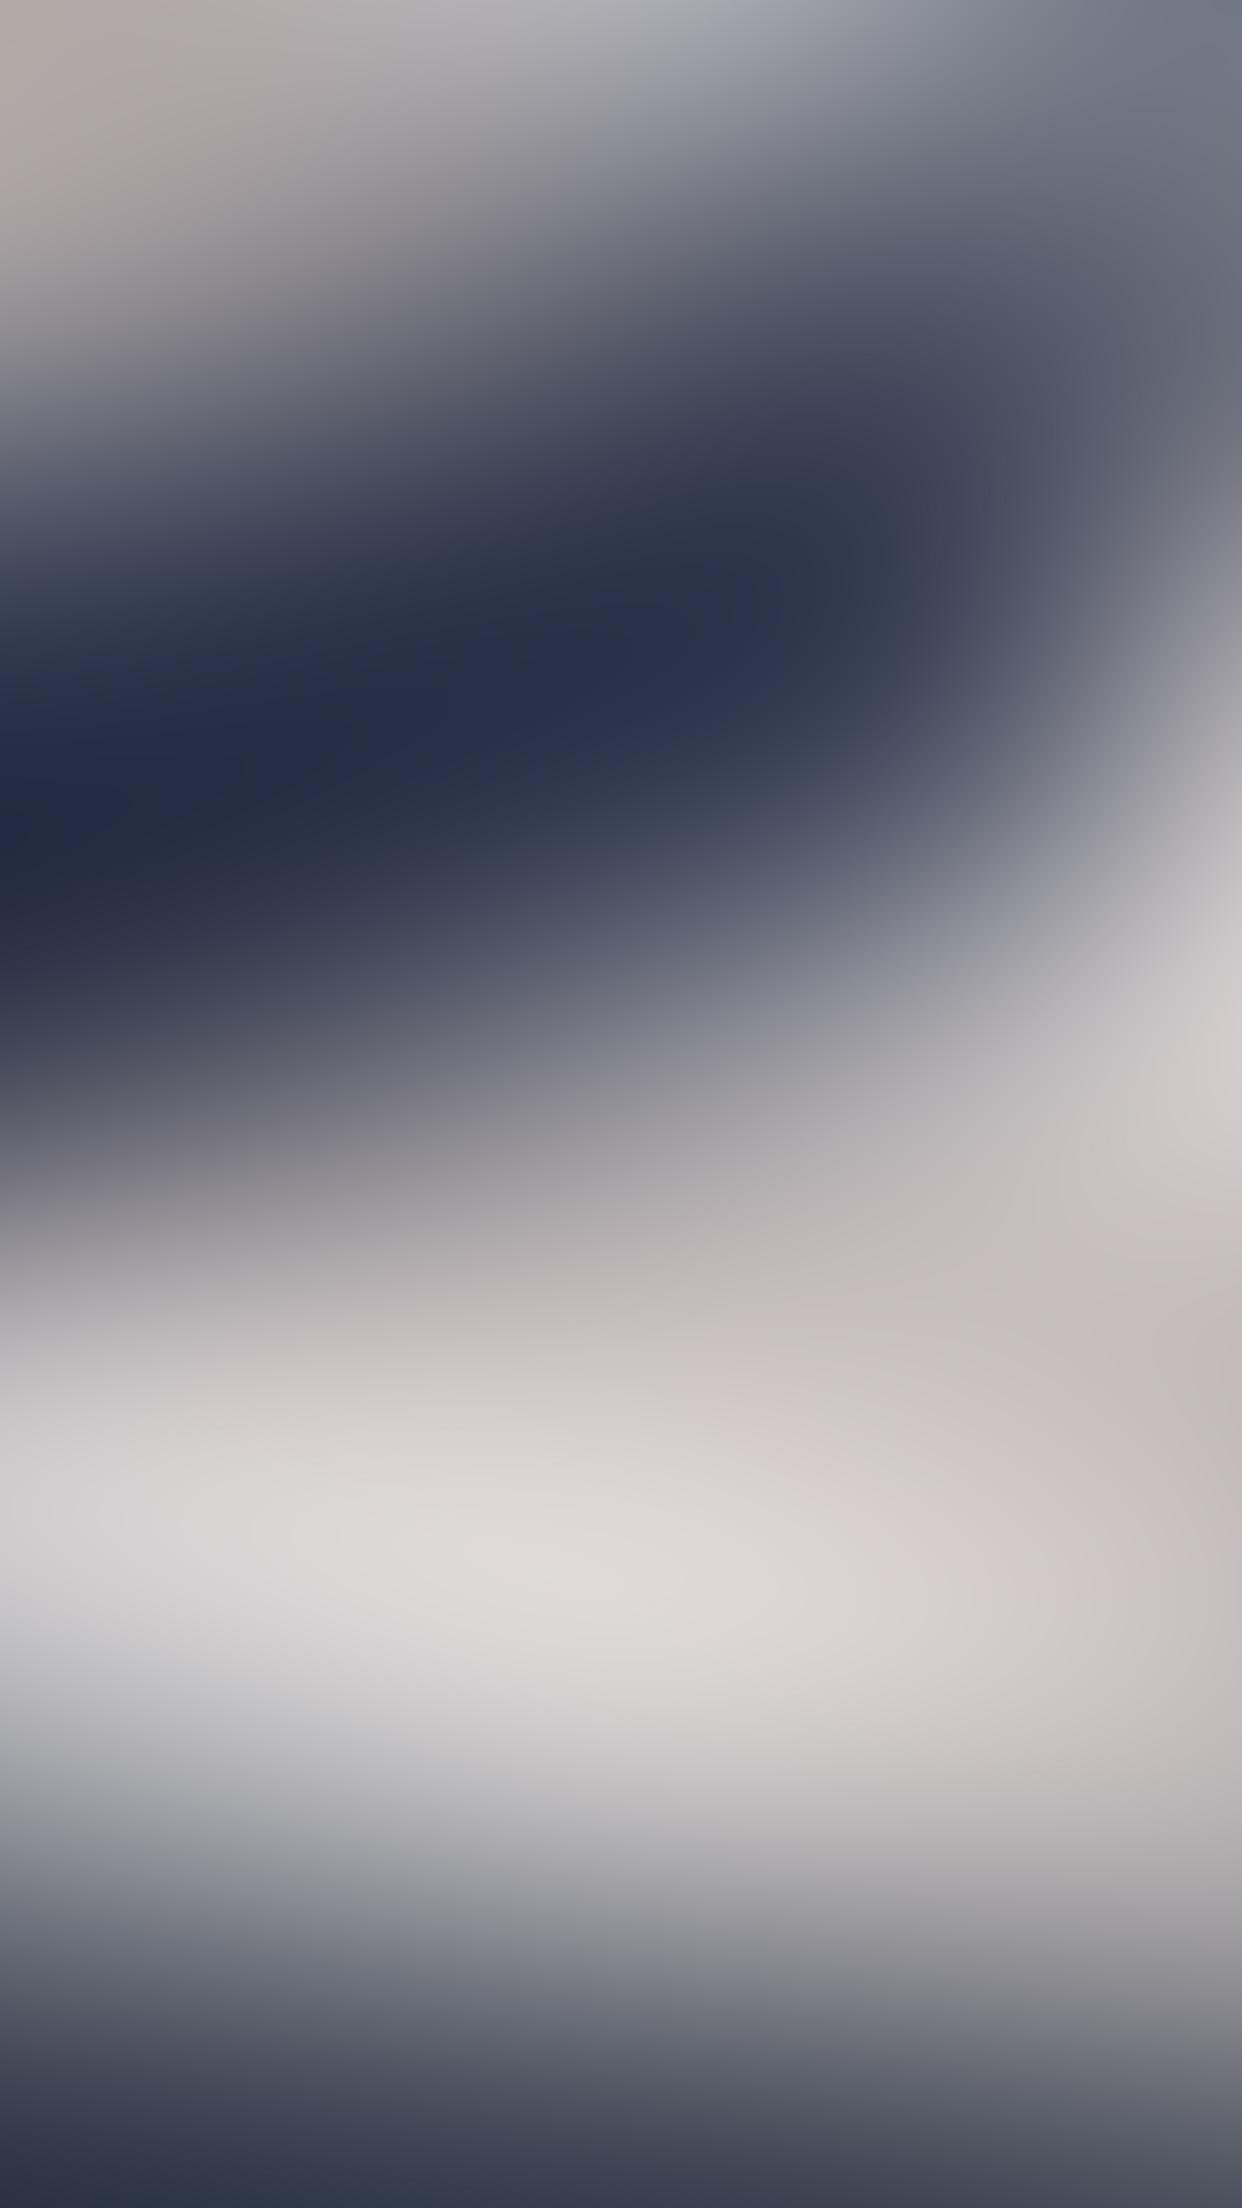 Iphonepapers Com Iphone 8 Wallpaper Sj60 Blue Gray